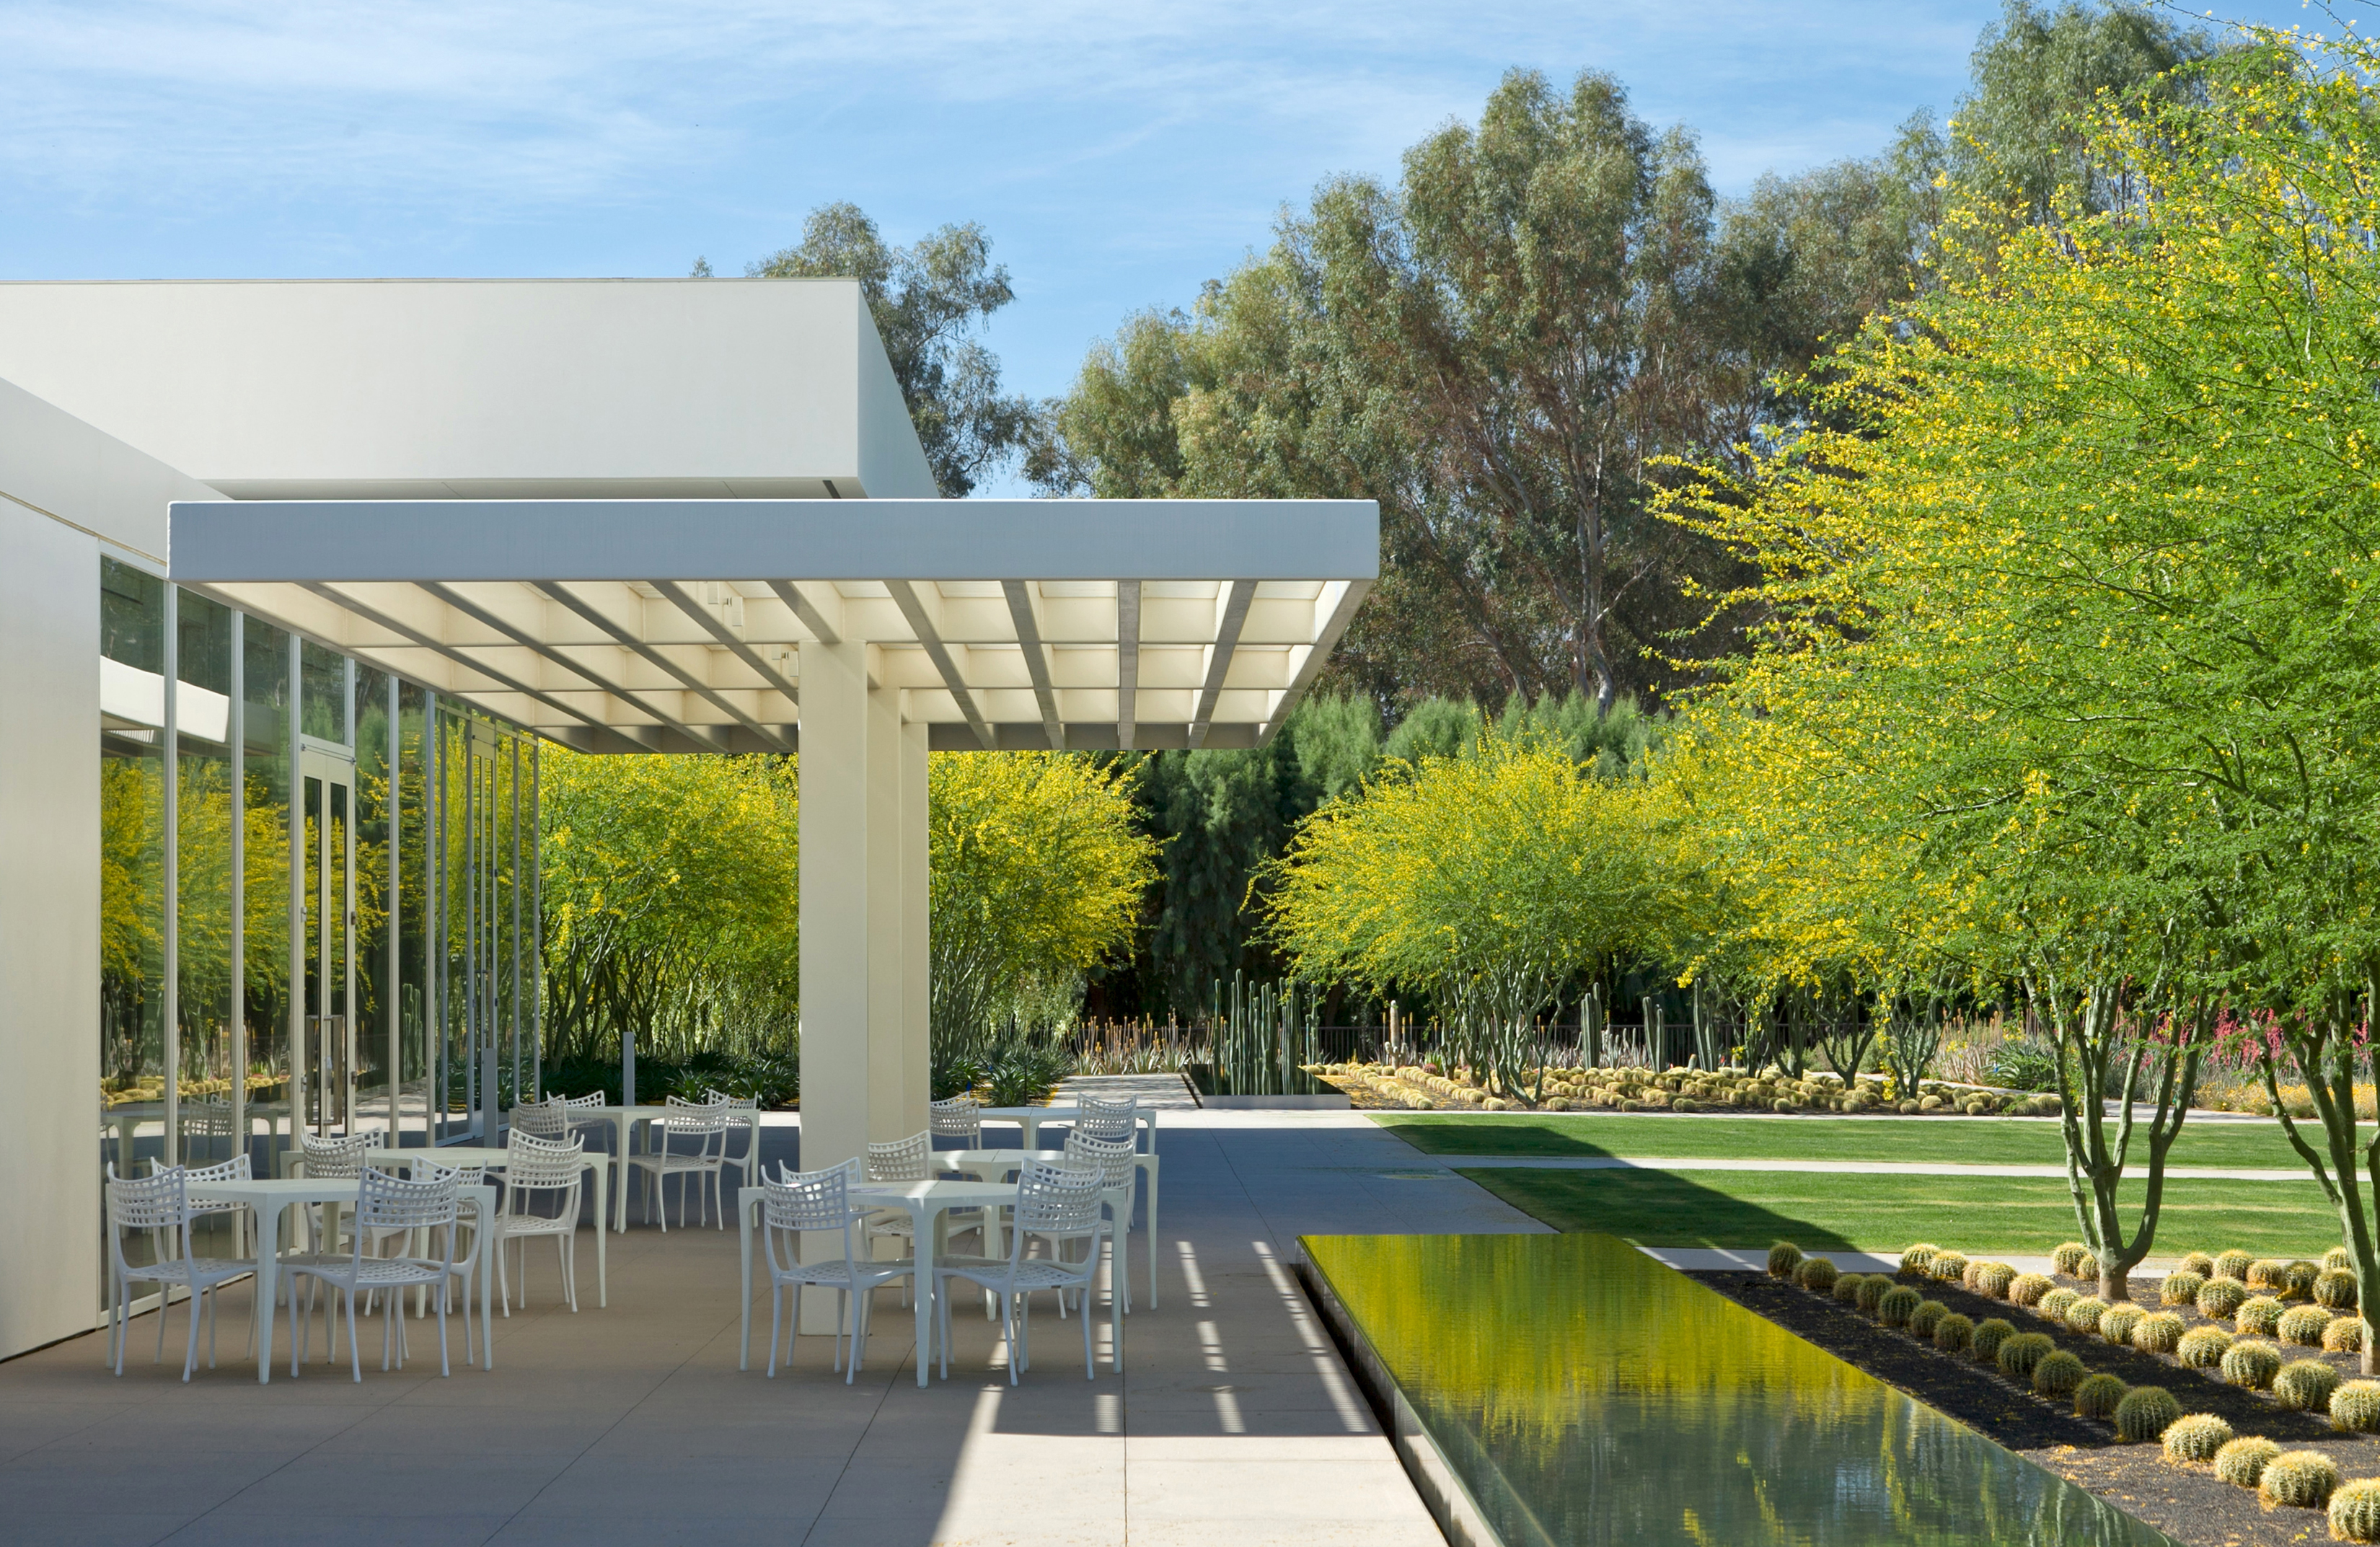 Asla 2012 professional awards sunnylands center gardens for Restaurants with a terrace